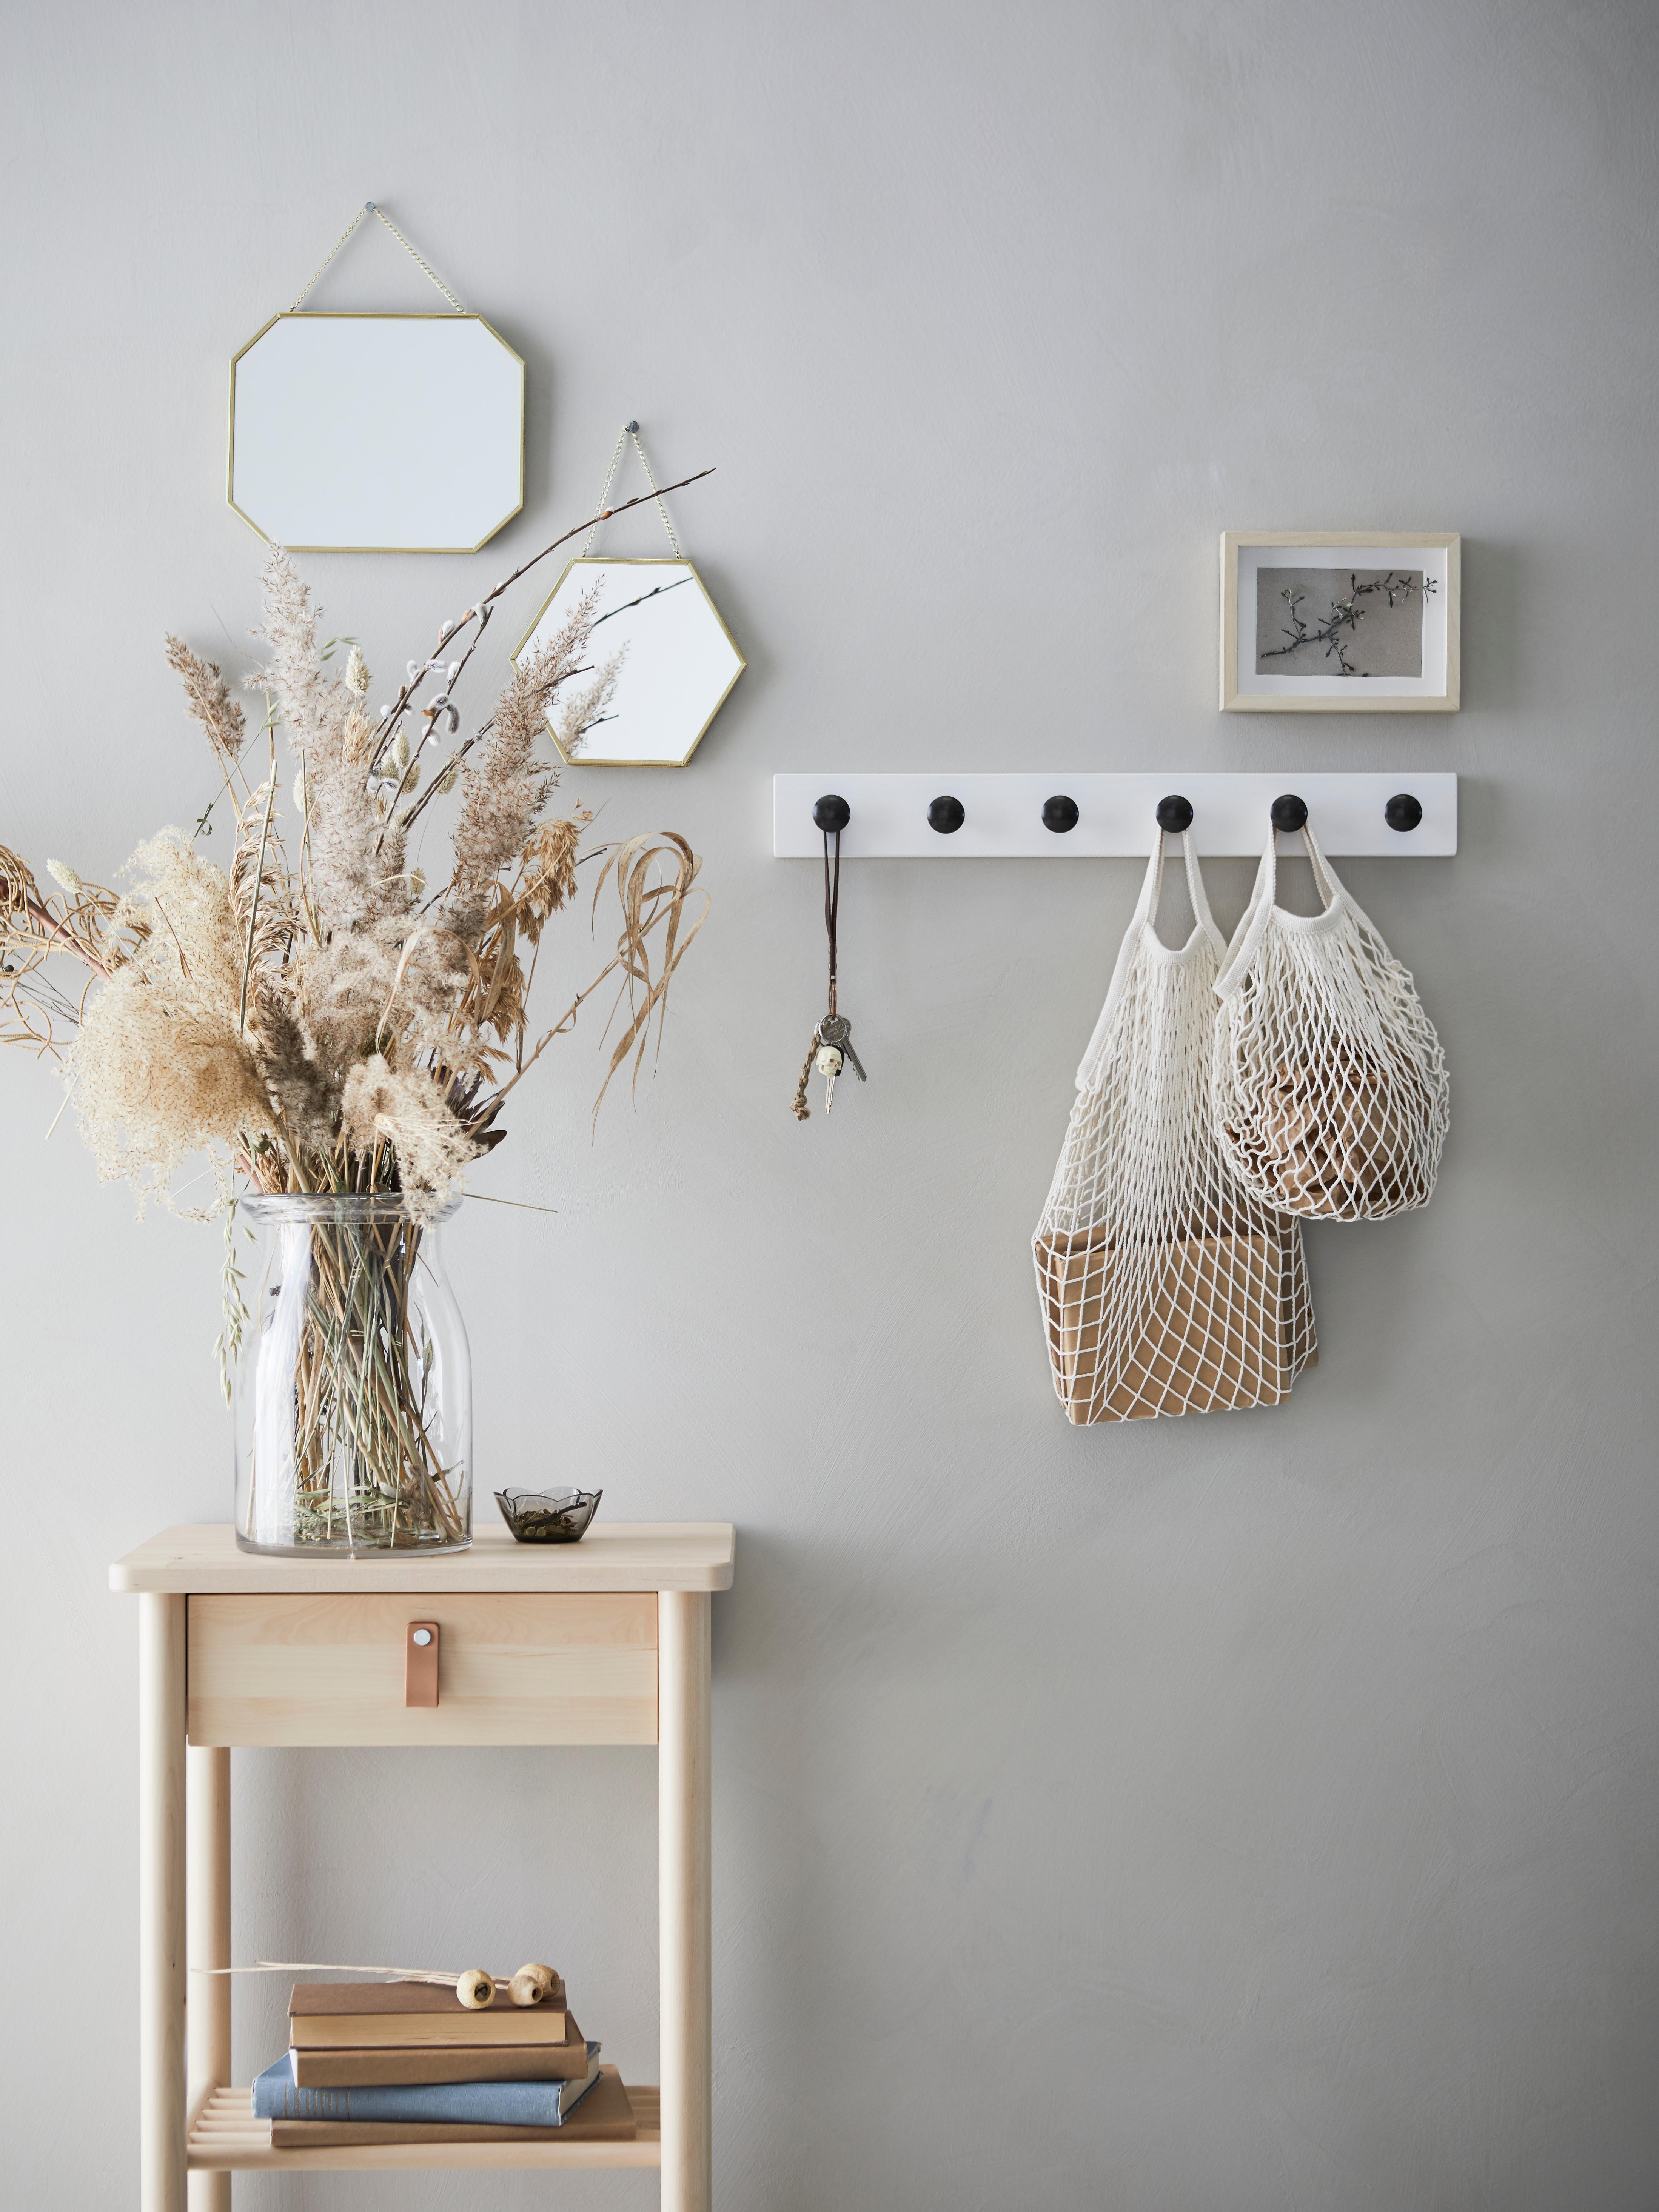 LASSBYN 라스뷘 거울과 액자, 네트가방이 후크 레일에 걸려 있는 벽 앞의 보조테이블에 말린꽃을 꽂은 꽃병이 놓여 있어요.